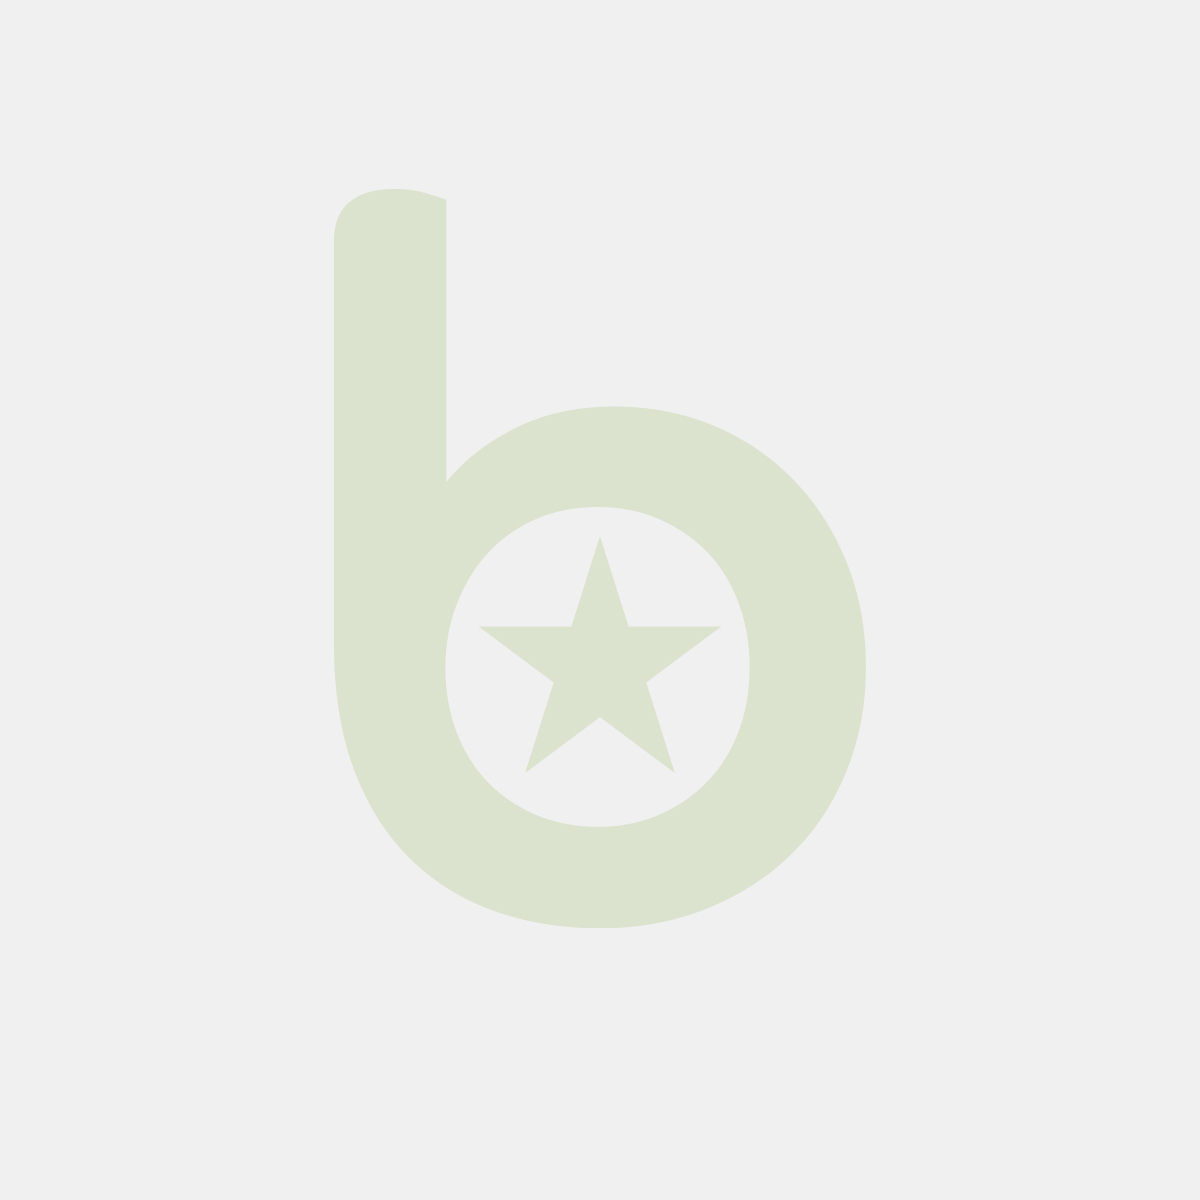 FINGERFOOD - pucharek PS transparentny 120ml 6,7x6,7x5,3 op. 25 sztuk